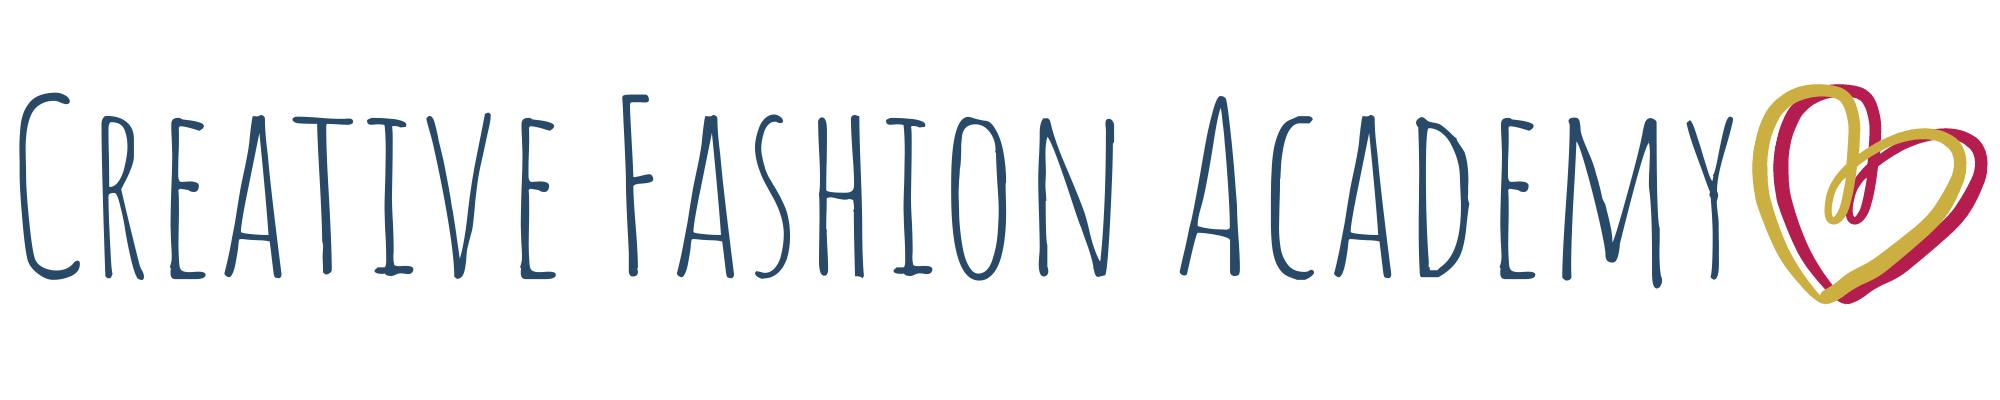 Creative Fashion Academy